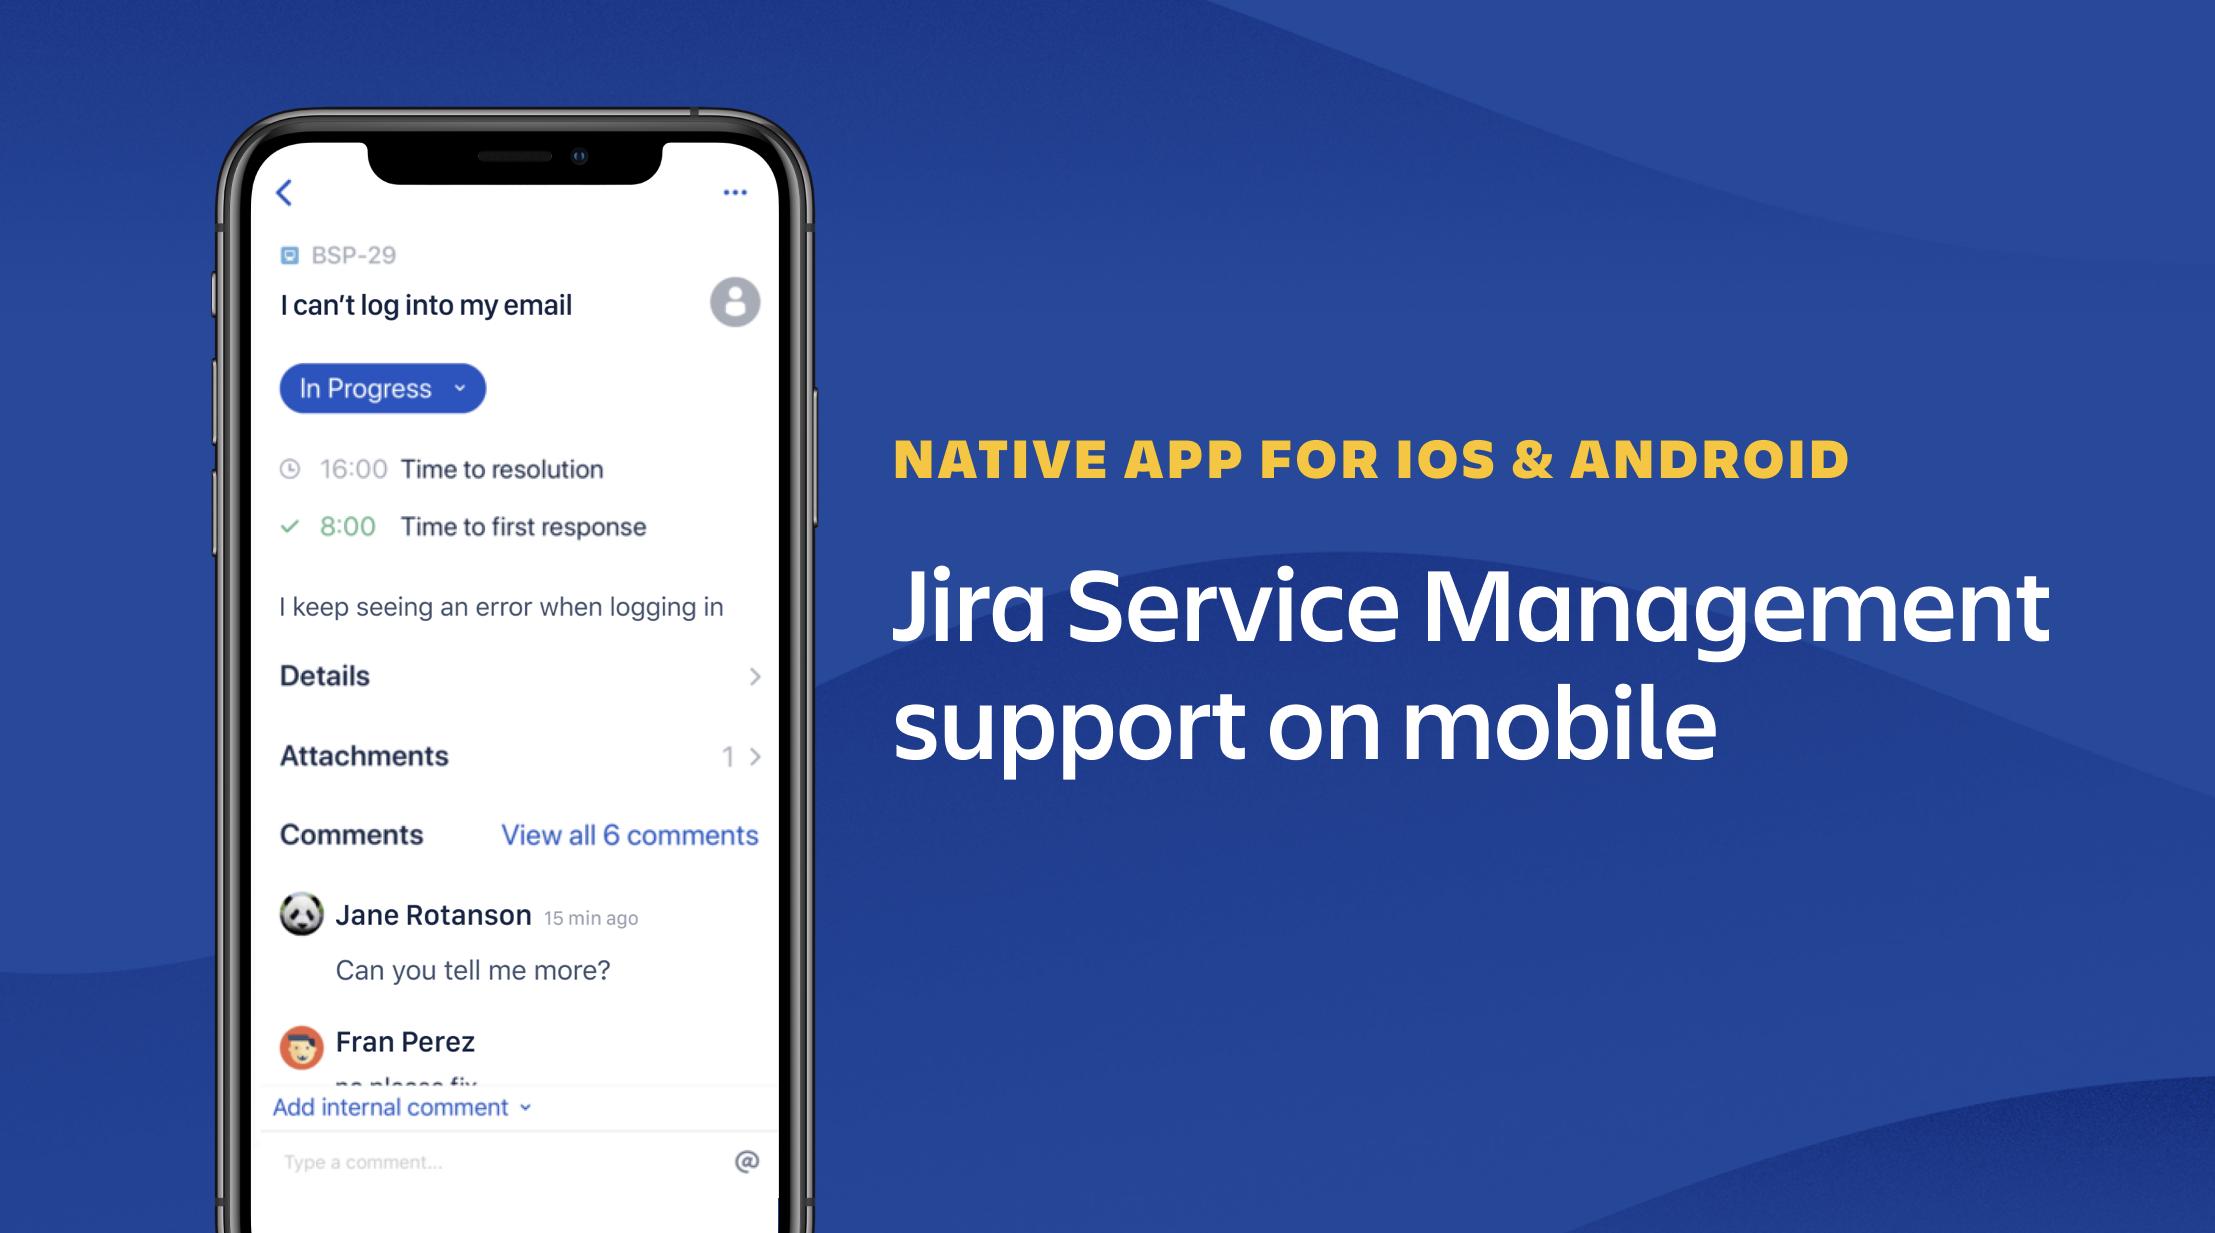 Jira service management 4 15 5